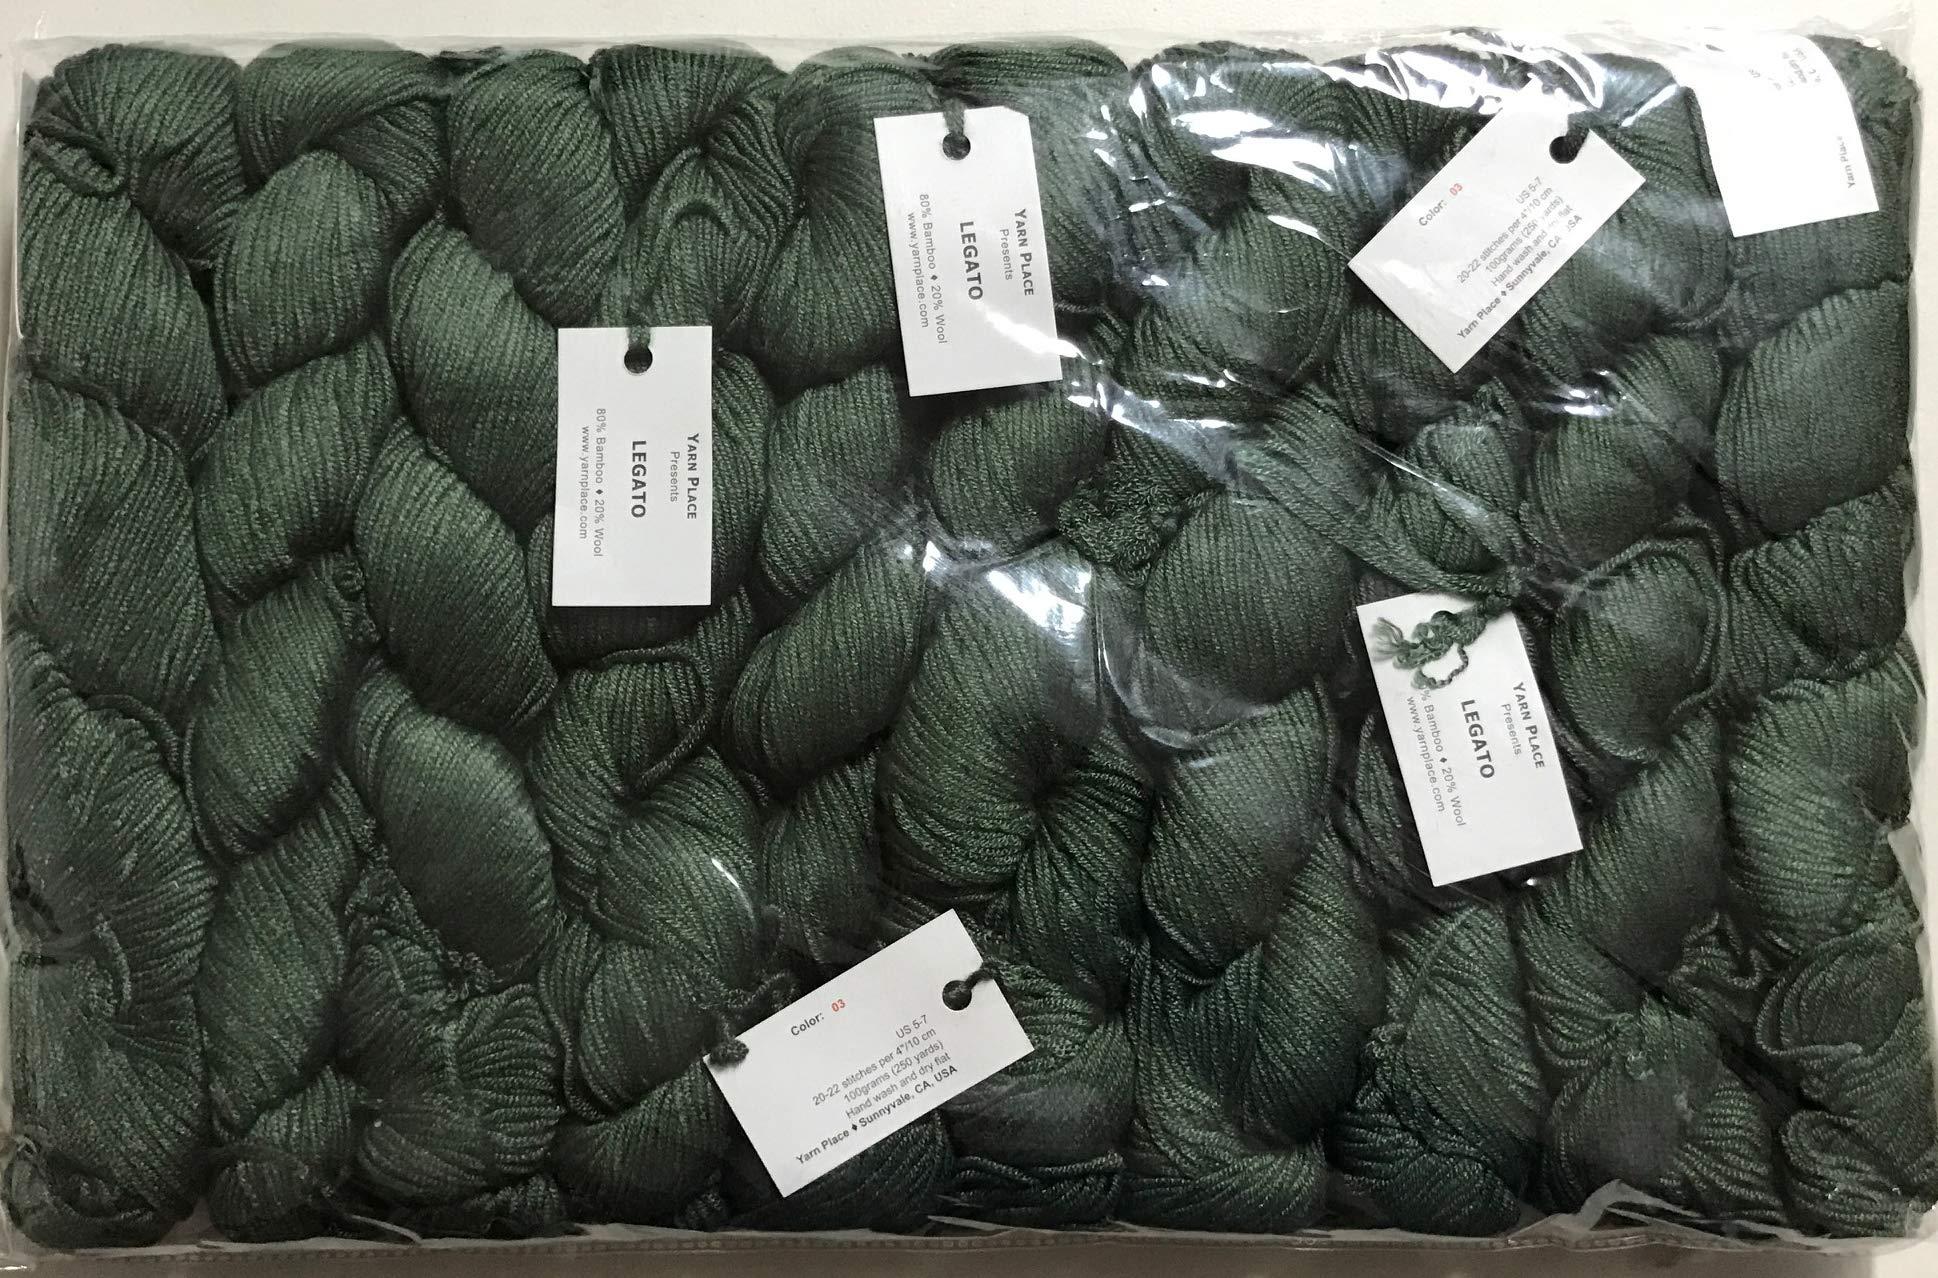 Yarn Place Legato 80% Bamboo and 20% Wool Yarn 100g 250 Yards DK (Dark Green (03))